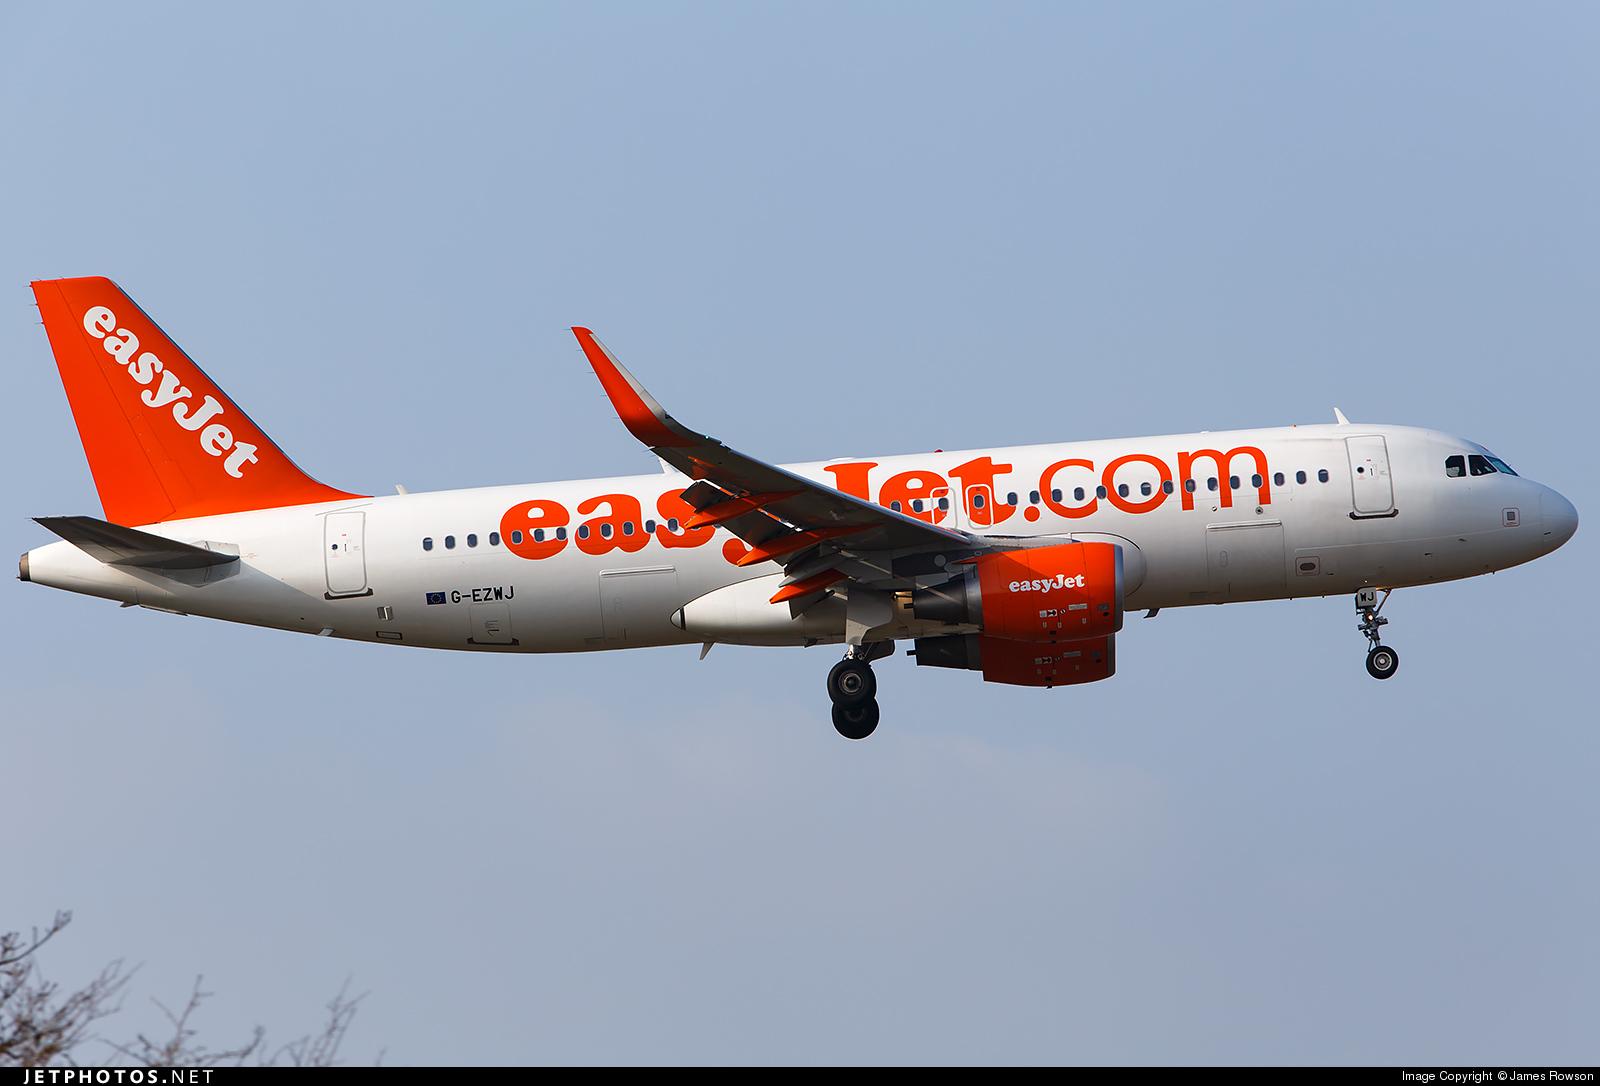 G-EZWJ - Airbus A320-214 - easyJet